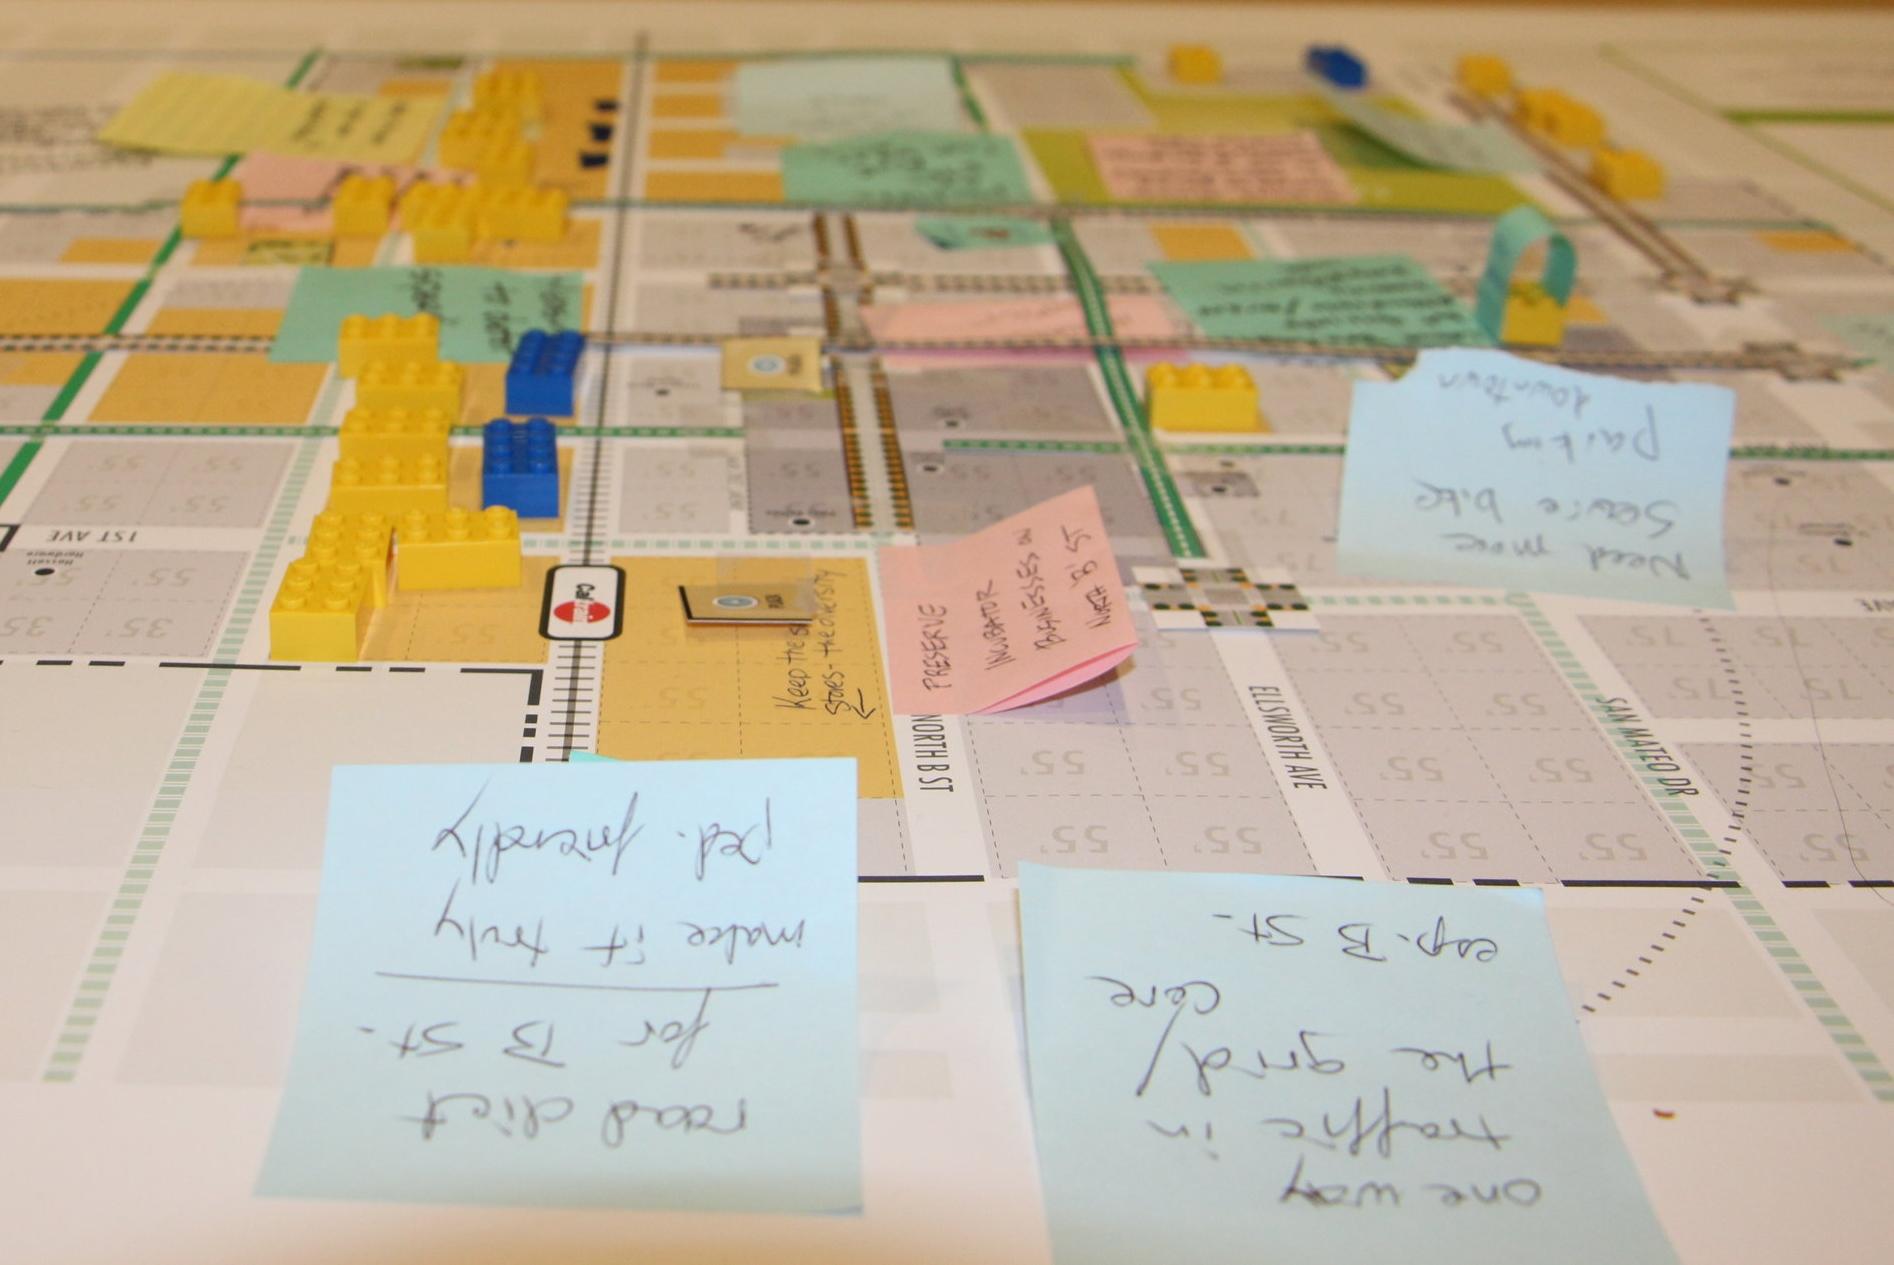 Group-3-Map1.JPG